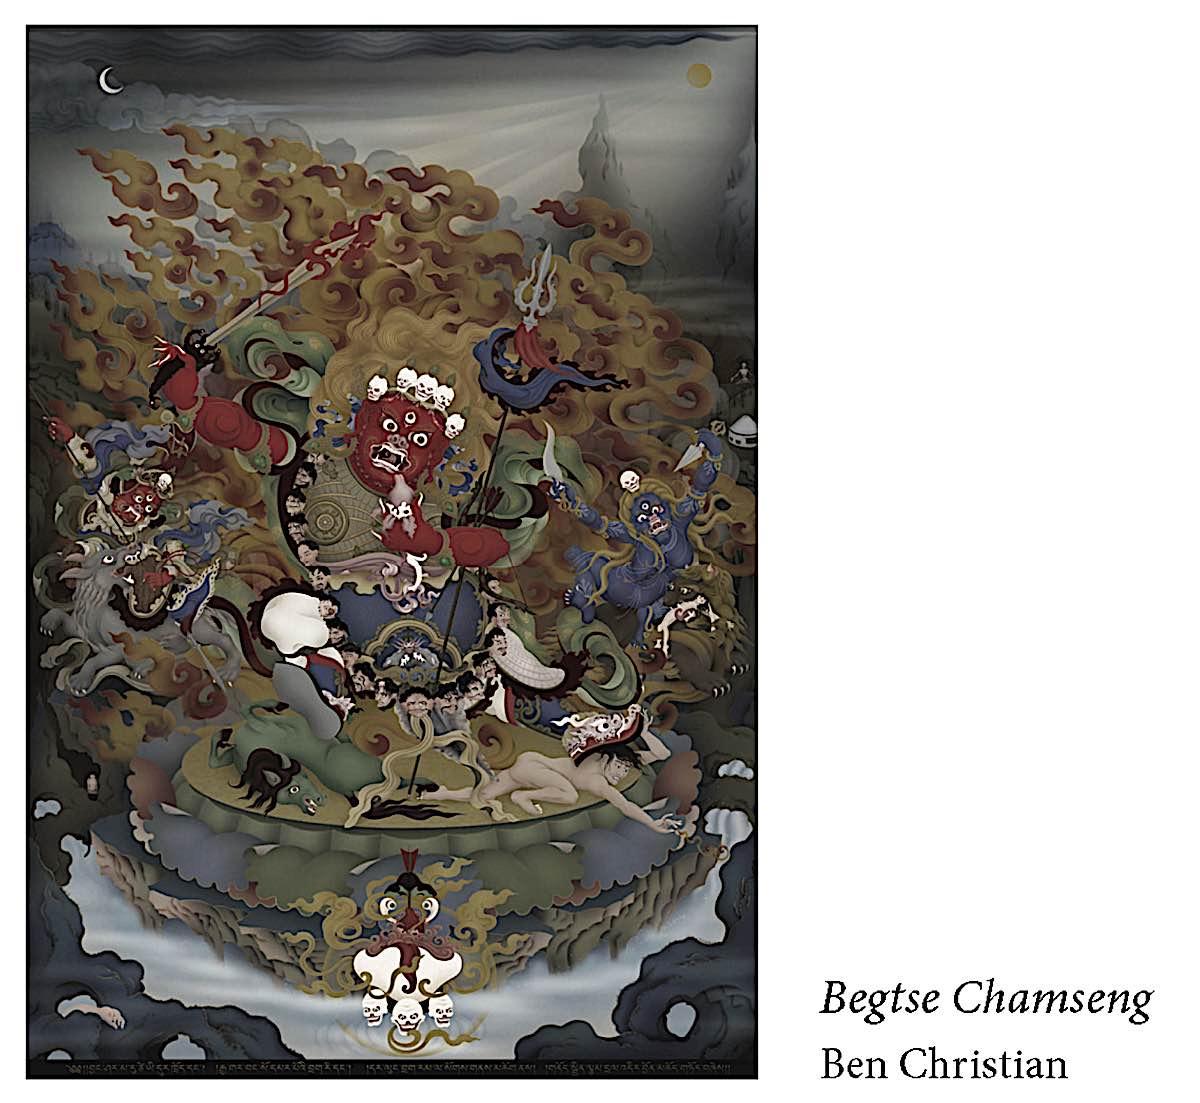 Buddha Weekly Begtse Chemseng Ben Christian a Protector of the Hayagriva cycle Buddhism